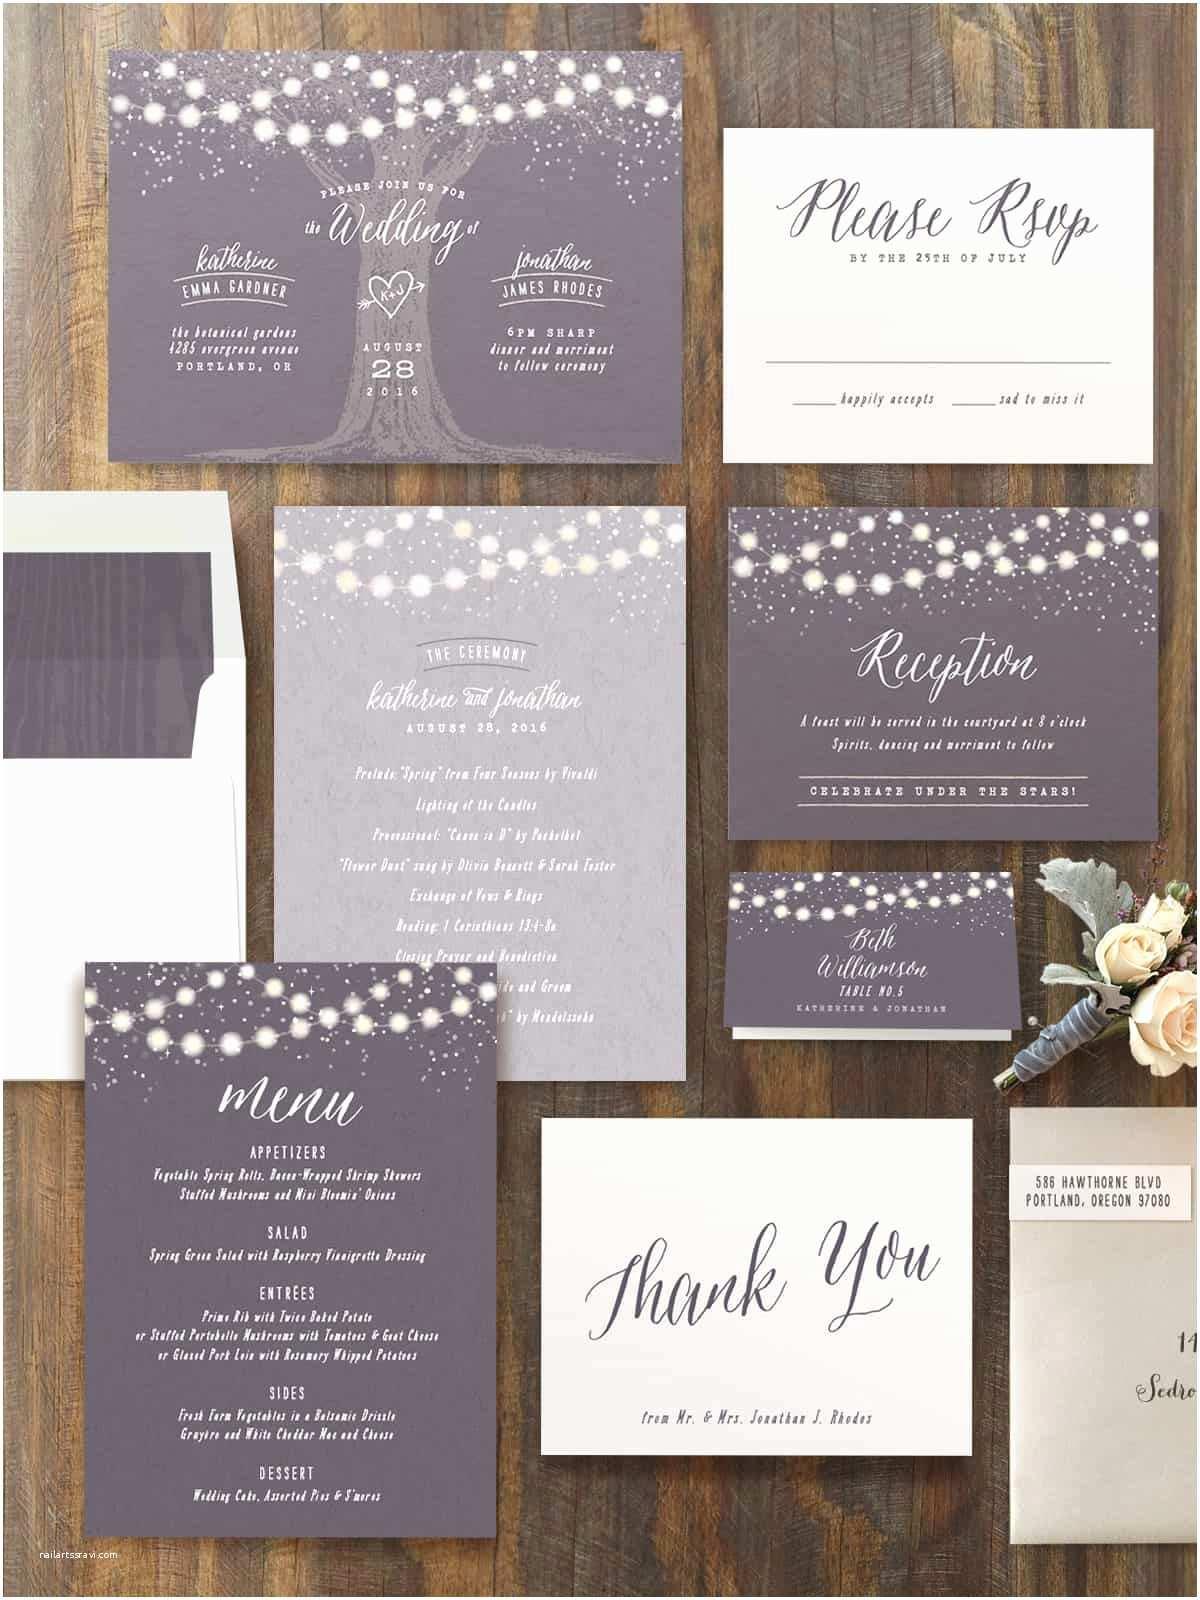 Cvs Wedding Invitations Cvs Bridal Shower Invitations – Mini Bridal